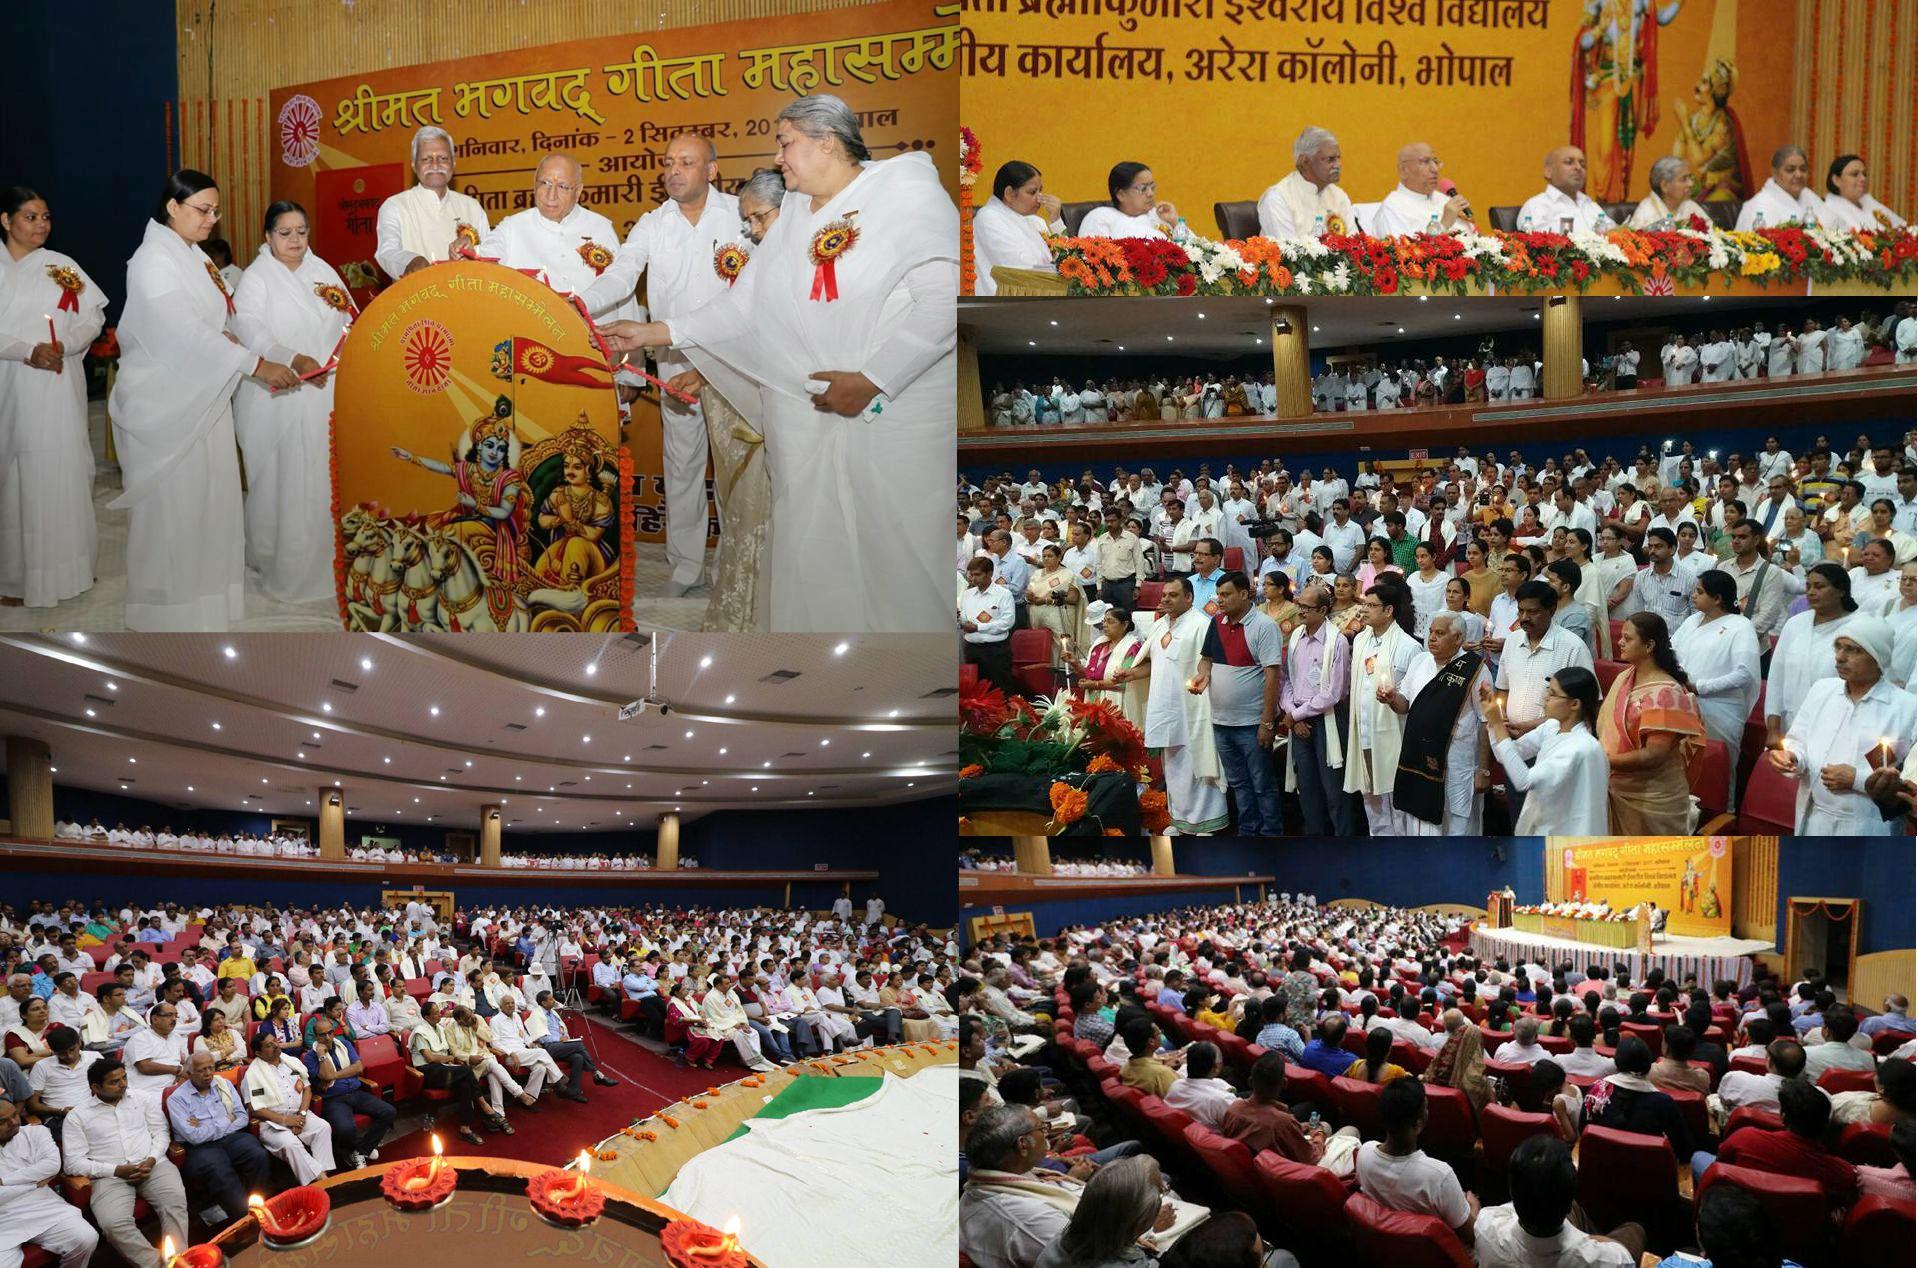 Geeta Conferance